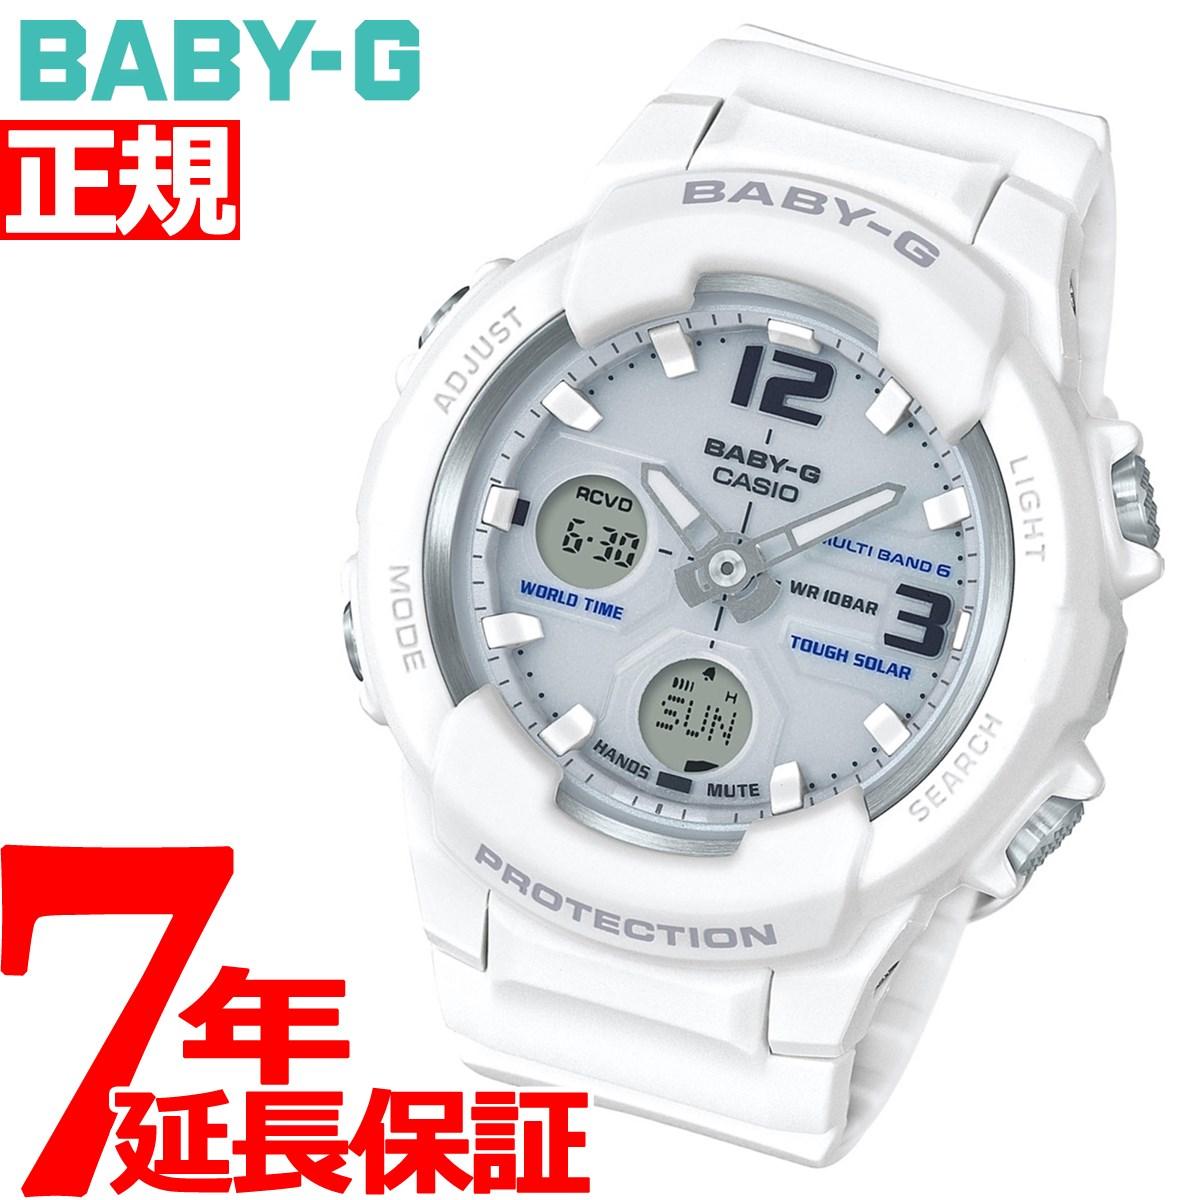 CASIO BABY-G カシオ ベビーG 電波 ソーラー 電波時計 腕時計 レディース ホワイト アナデジ BGA-2300-7BJF